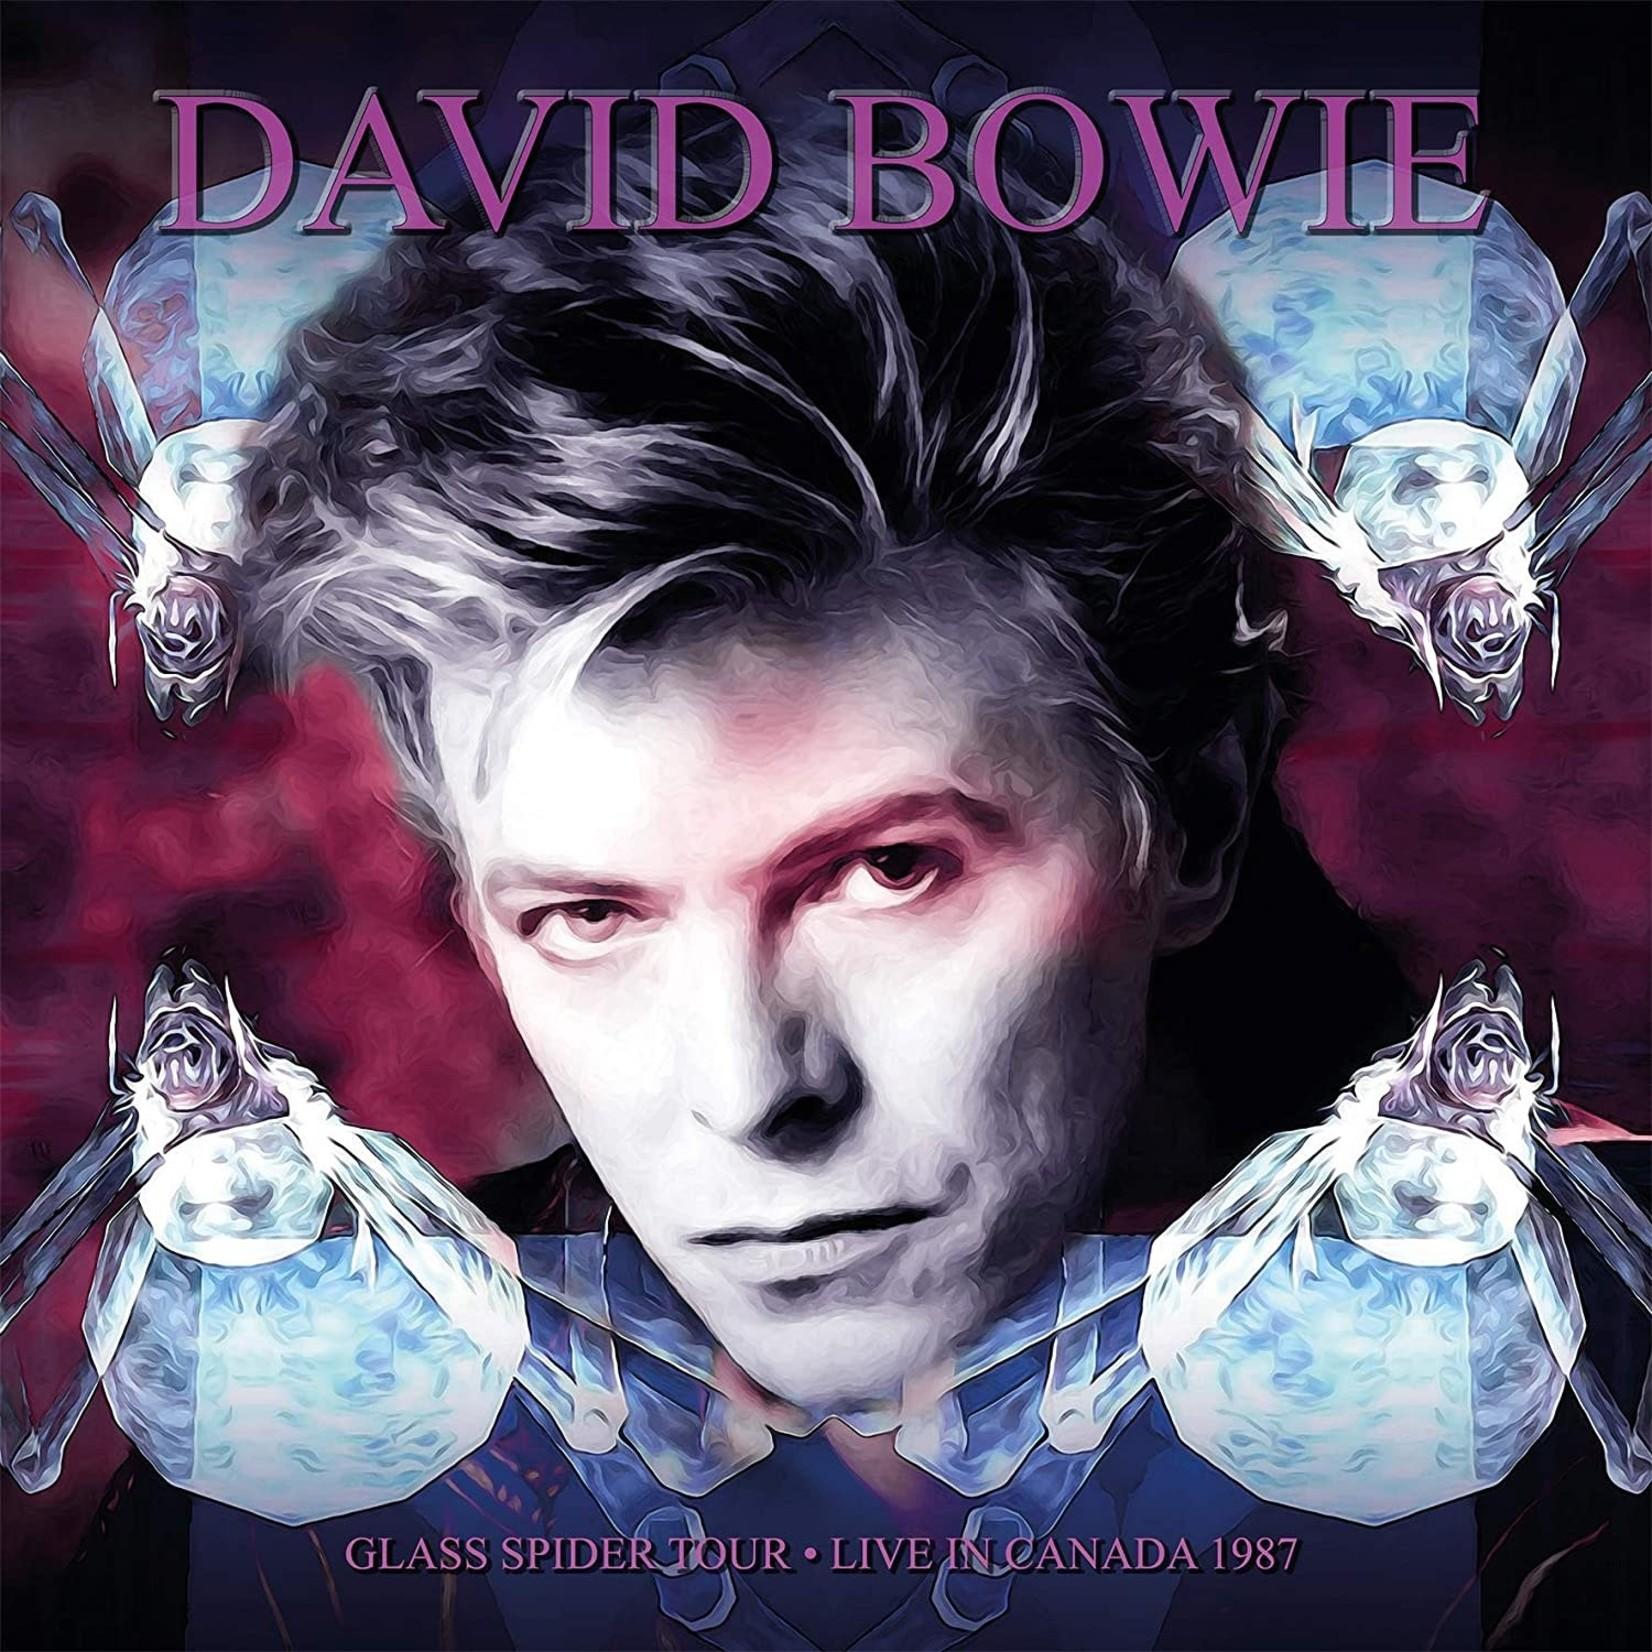 DAVID BOWIE GLASS SPIDER TOUR 1987 (LTD PURPLE VINYL)